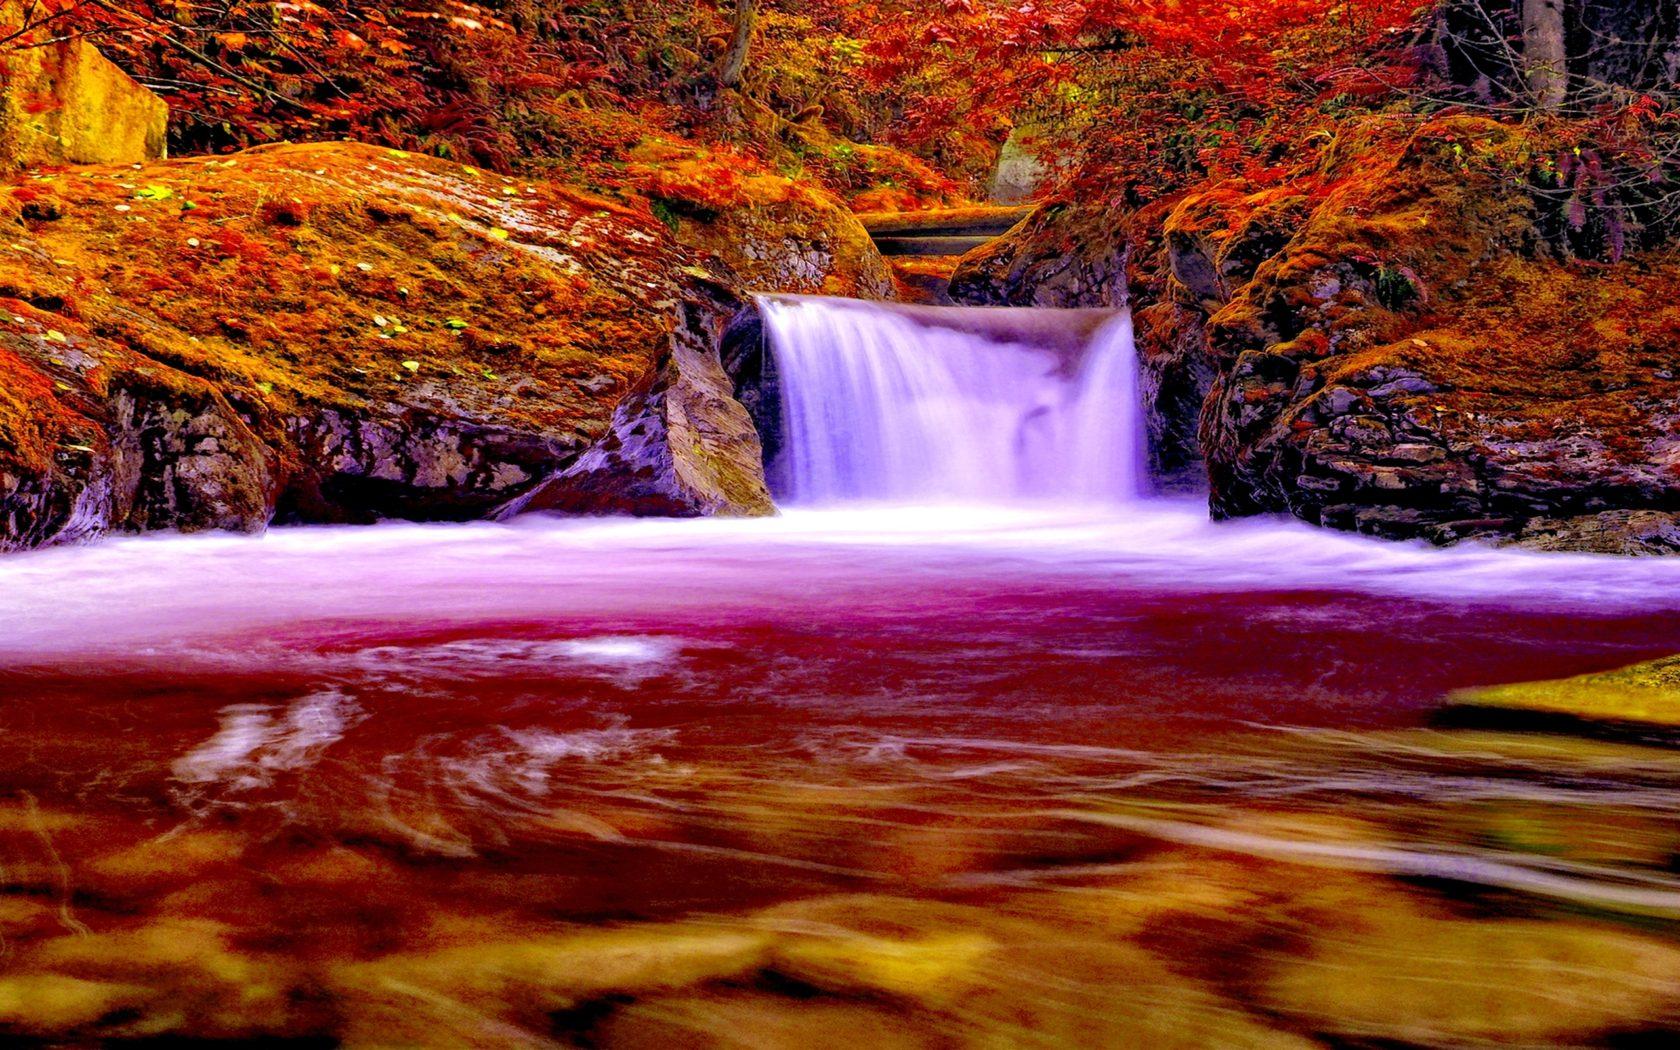 Stunning Fall Wallpapers Autumn Forest Falls Nature Waterfall 745340 2560x1600